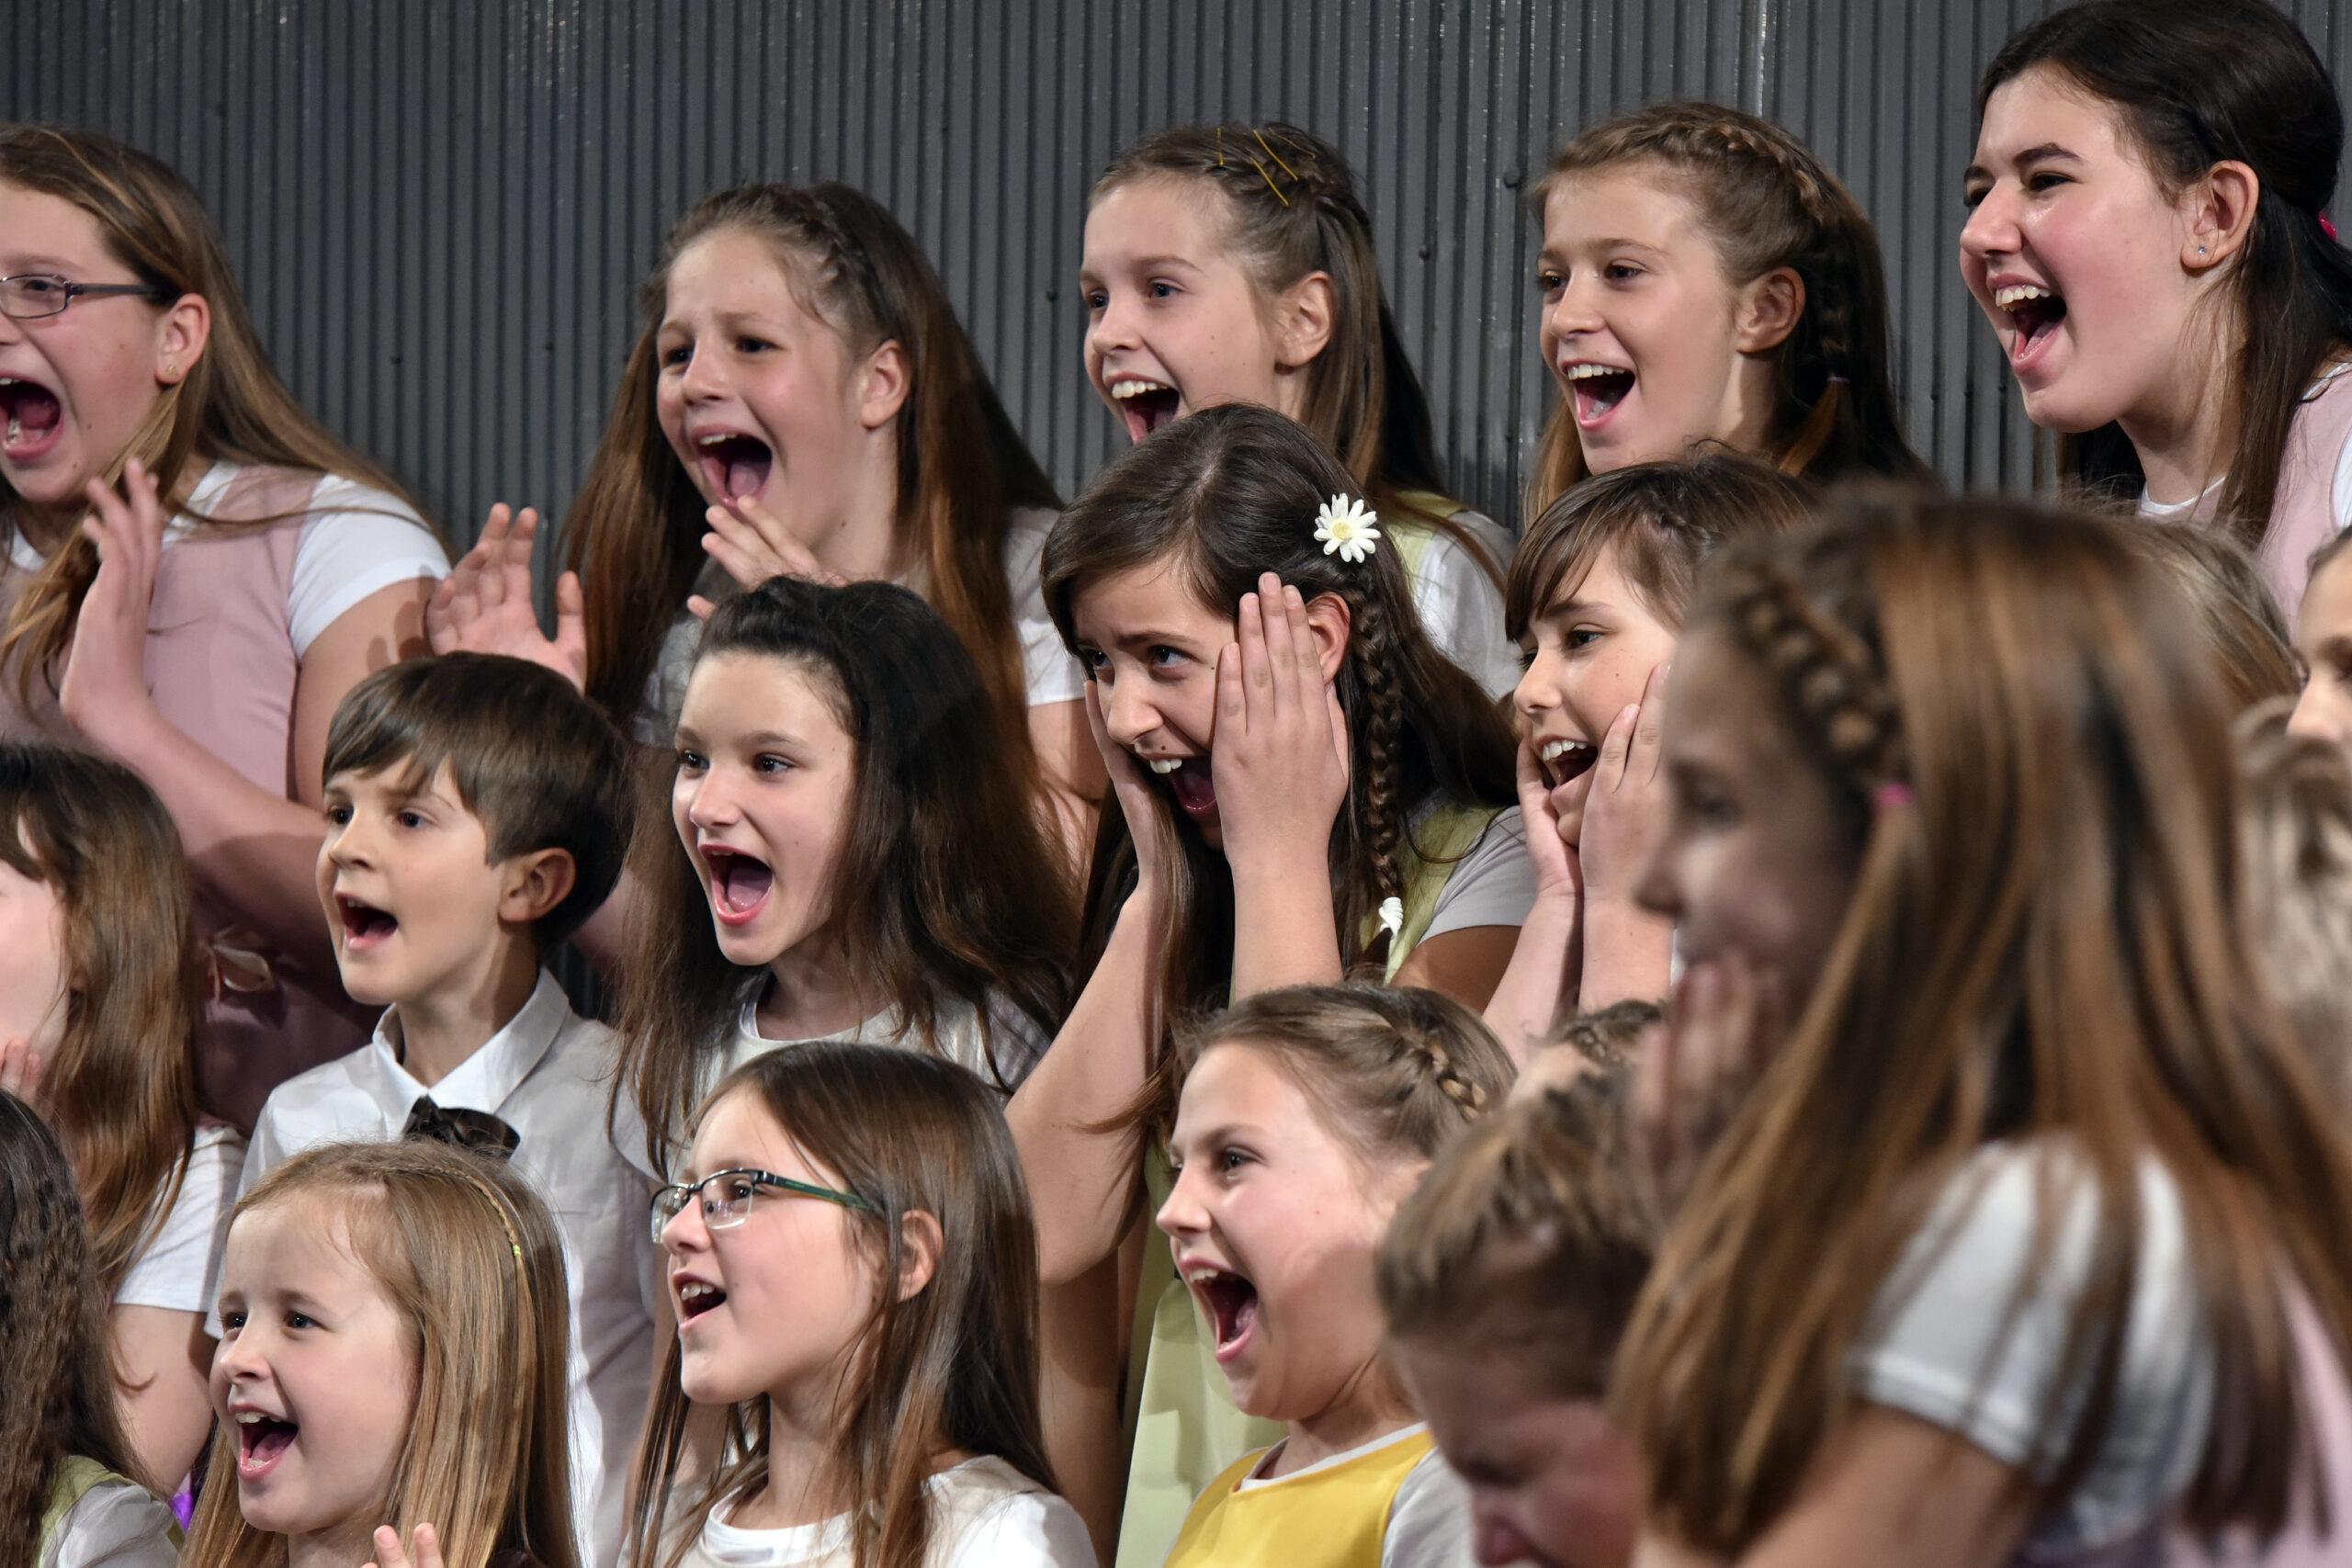 Janez Eržen, Slovenija/Slovenia: Pri zobozdravniku  2018, OPZ OŠ Radlje ob Dravi, Slovenija / At the dentist, 2018, Children's choir of the primary school Radlje ob Dravi, Slovenia